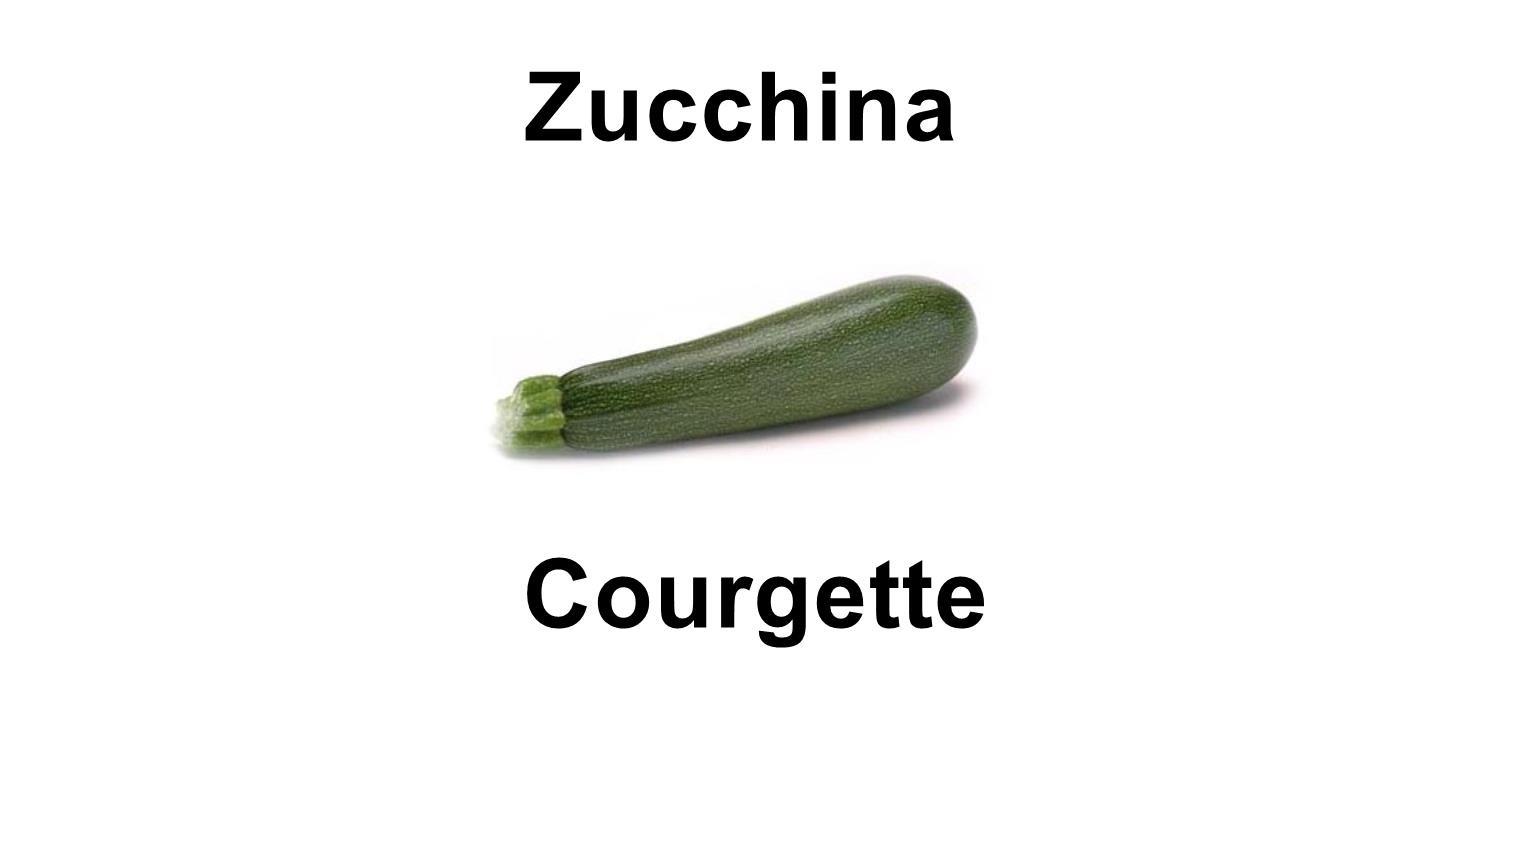 Pumpkin Names Of Vegetables